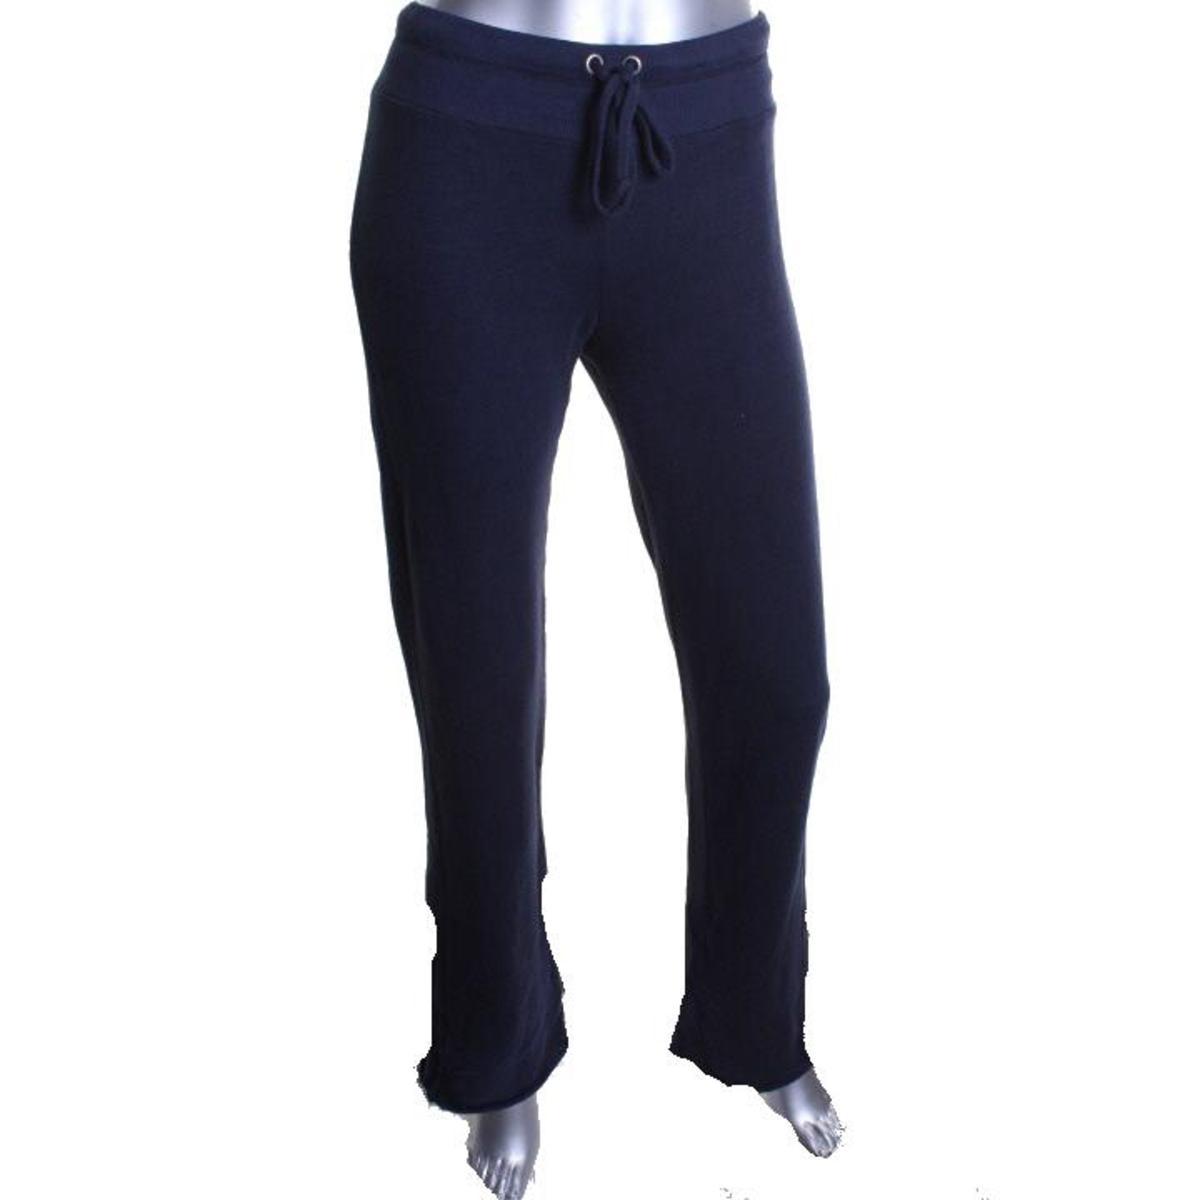 SPLENDID French Terry Raw Hem Lounge Pants